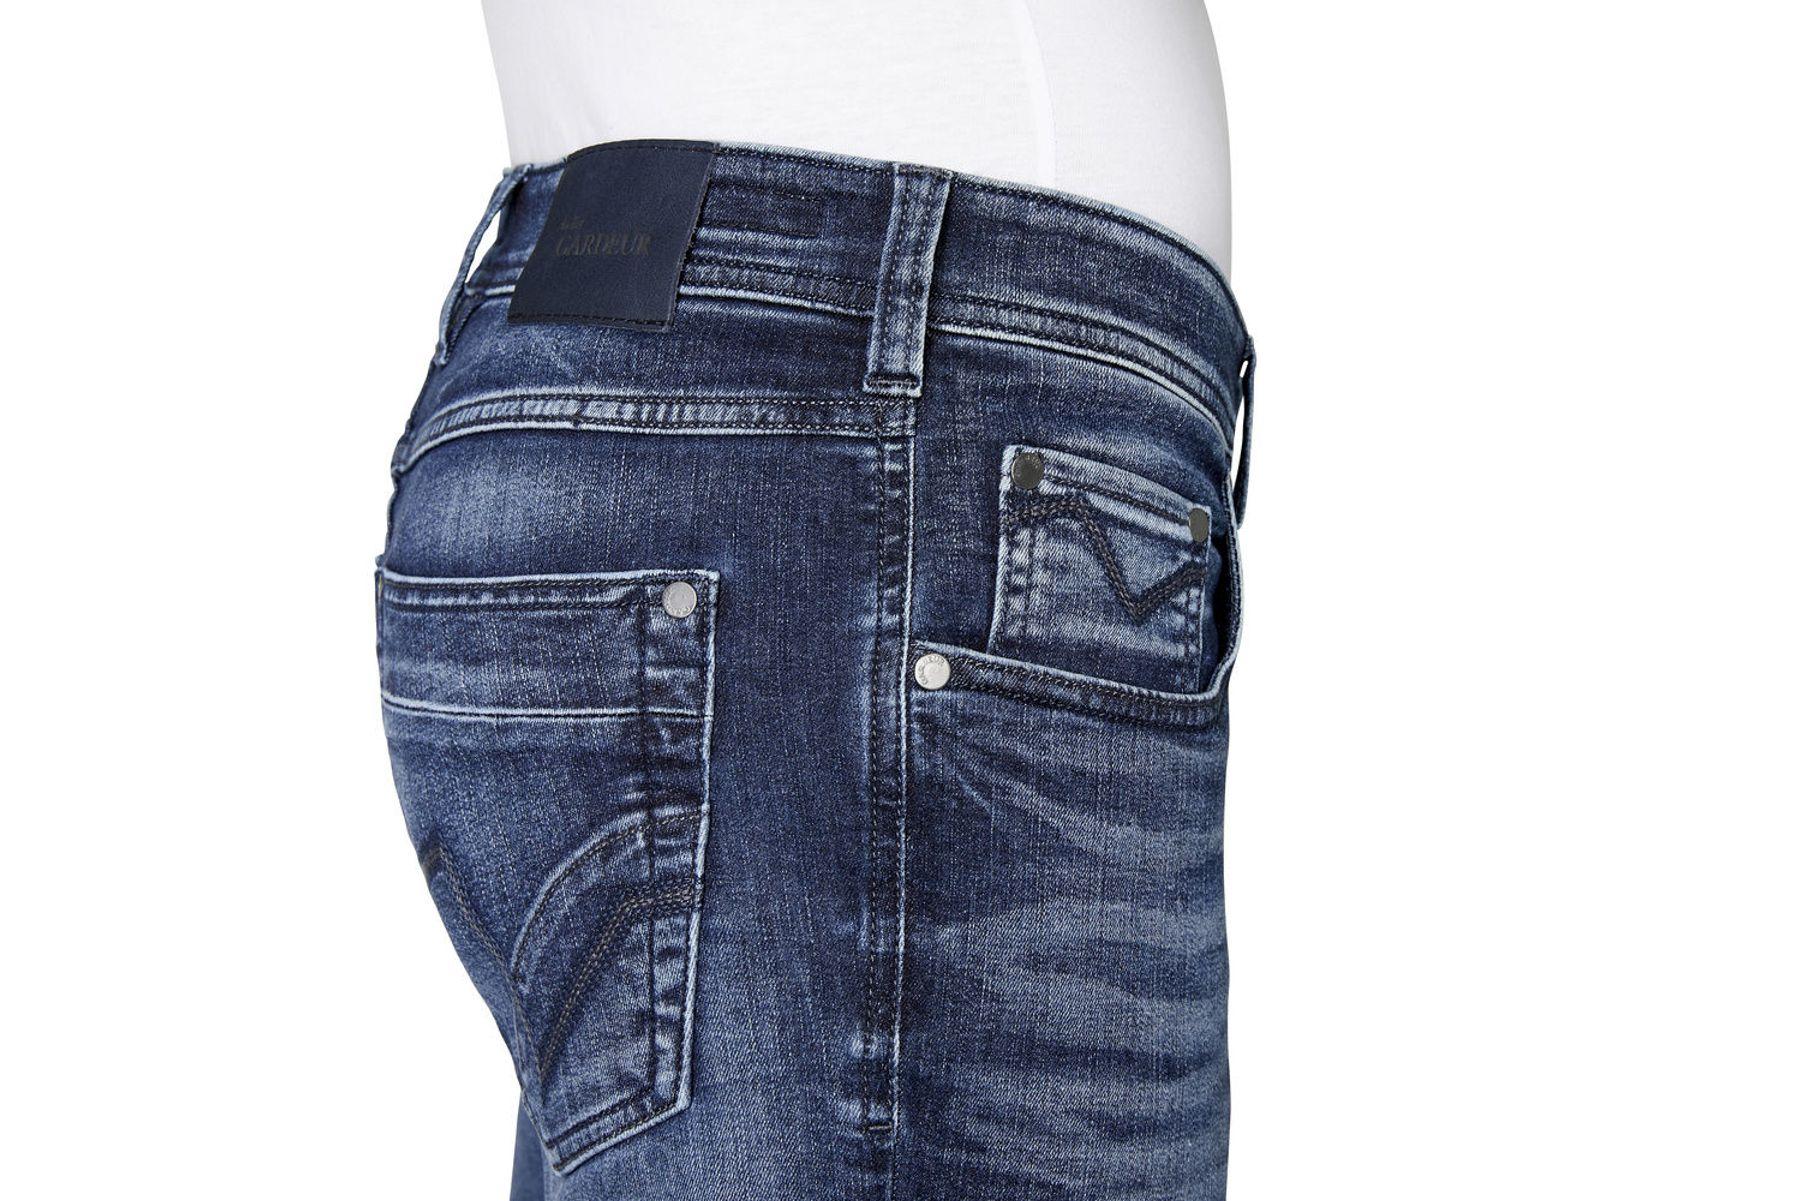 Atelier Gardeur - Modern Fit - Herren 5-Pocket Jeans, Denimstretch, Bill-8 (470391) – Bild 12